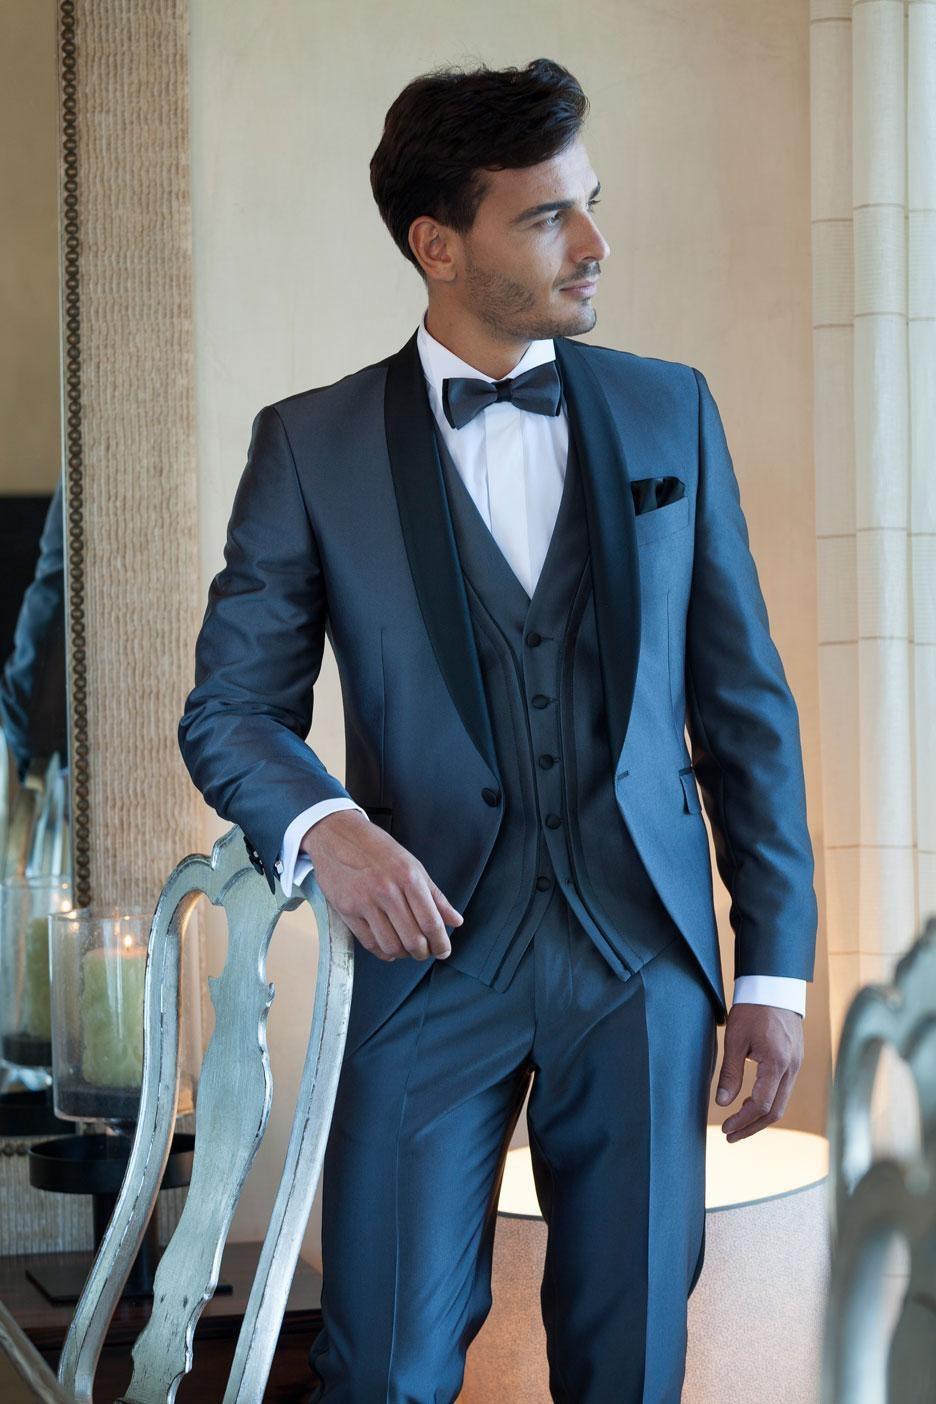 Online Get Cheap Cheap Custom Suits -Aliexpress.com | Alibaba Group